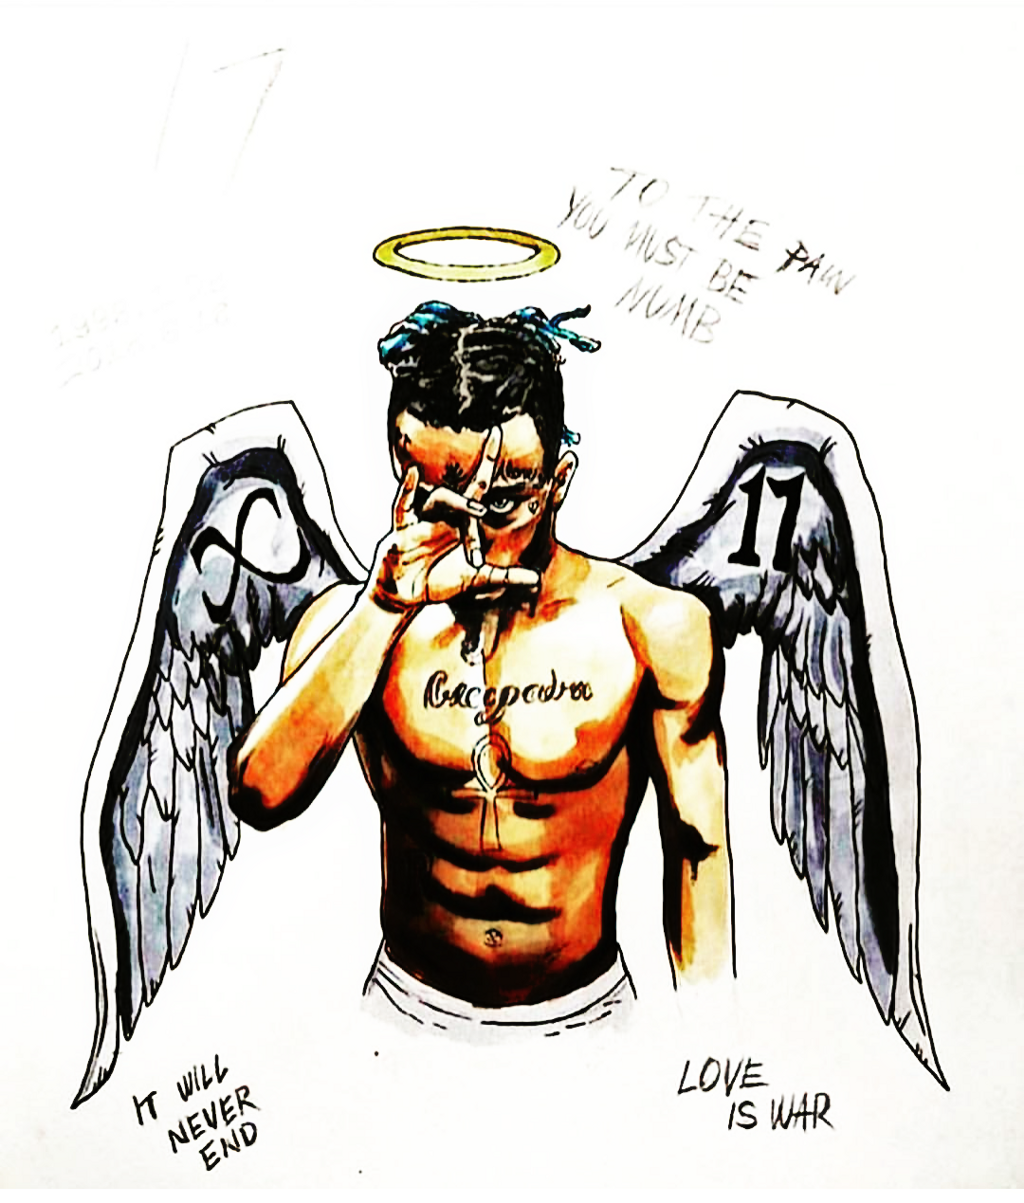 Drawing Xxxtentacion: Image By Juniorputiano